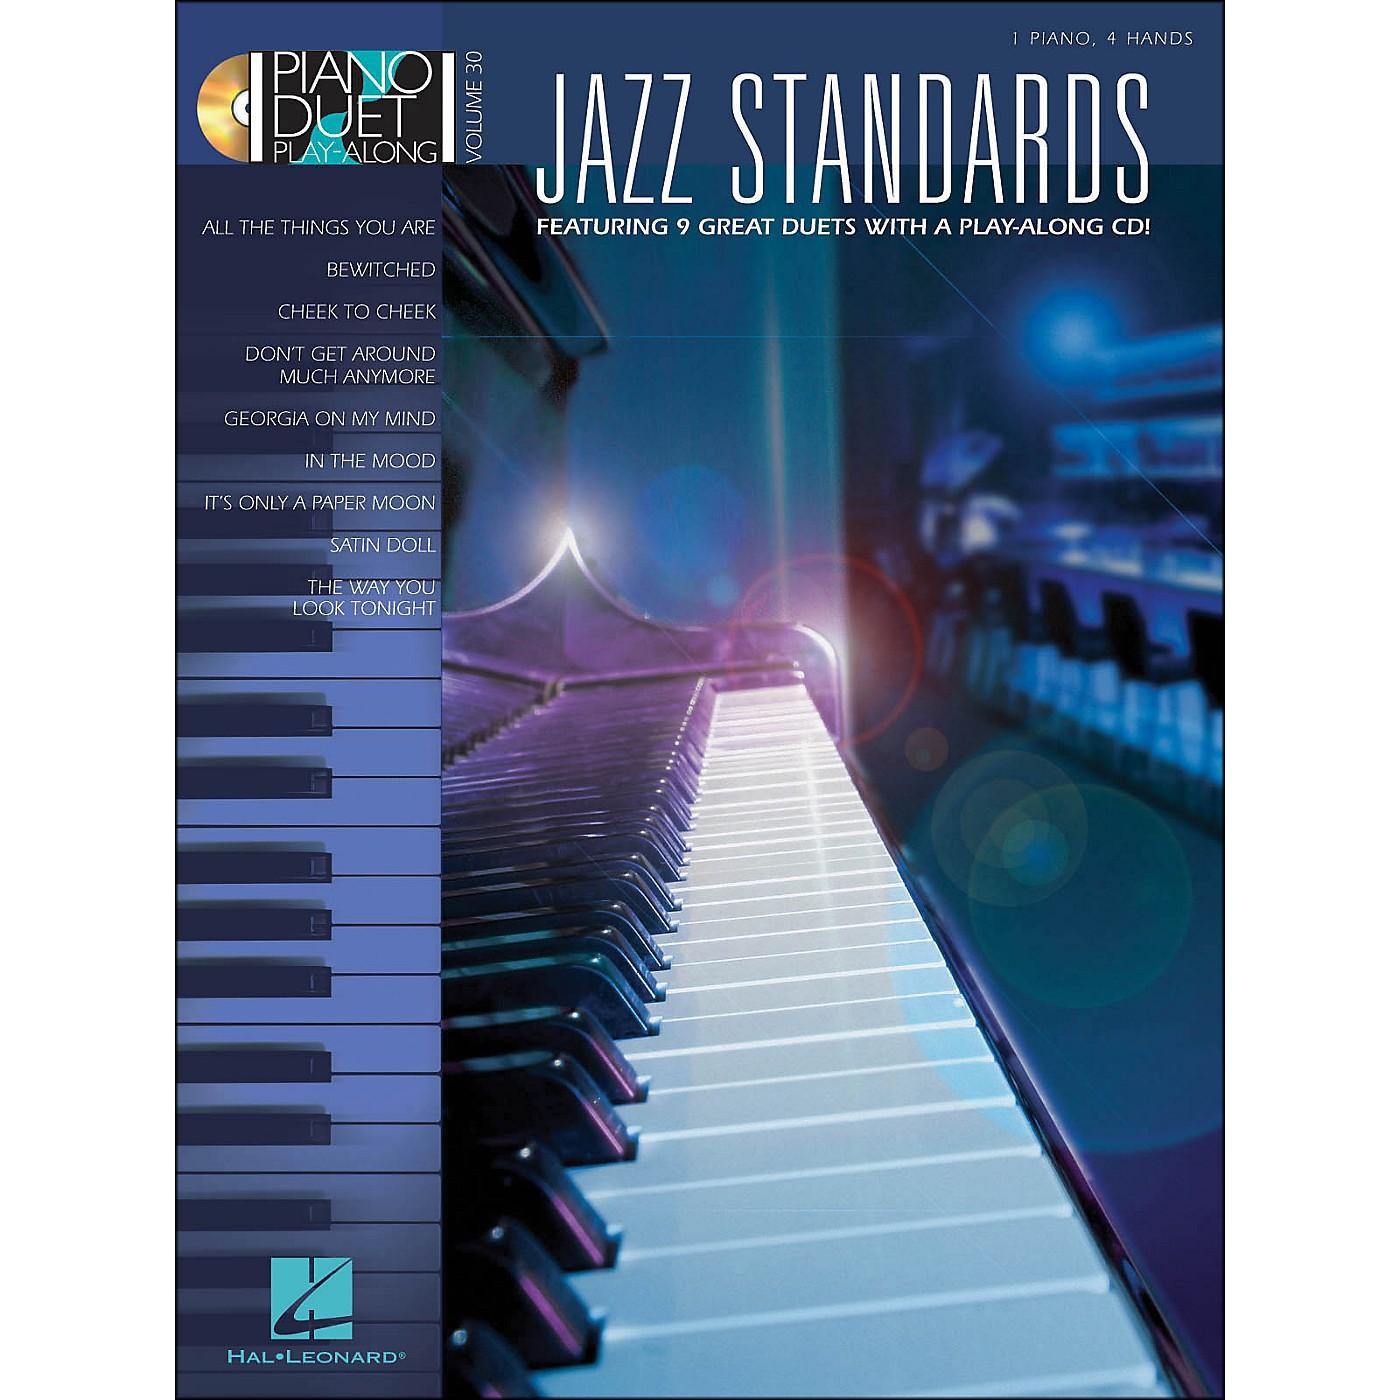 Hal Leonard Jazz Standards Piano Duet Play-Along Volume 30 Book/CD thumbnail